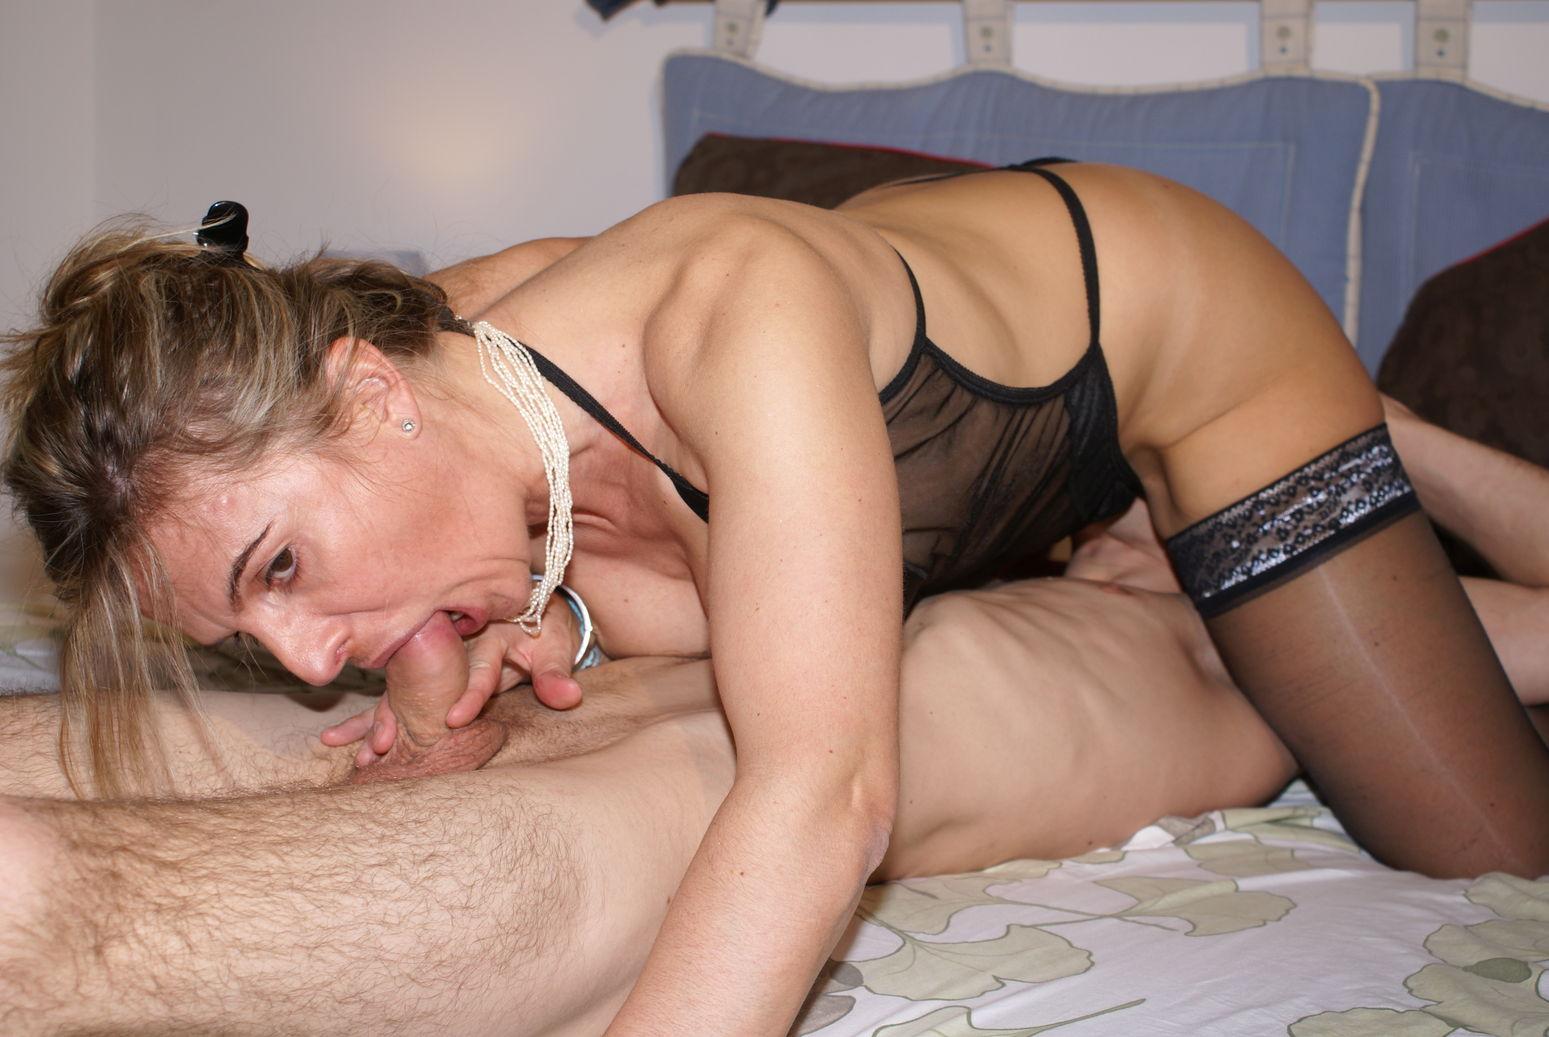 Florence initiatrice sexuelle - scène n°3 - 20:12